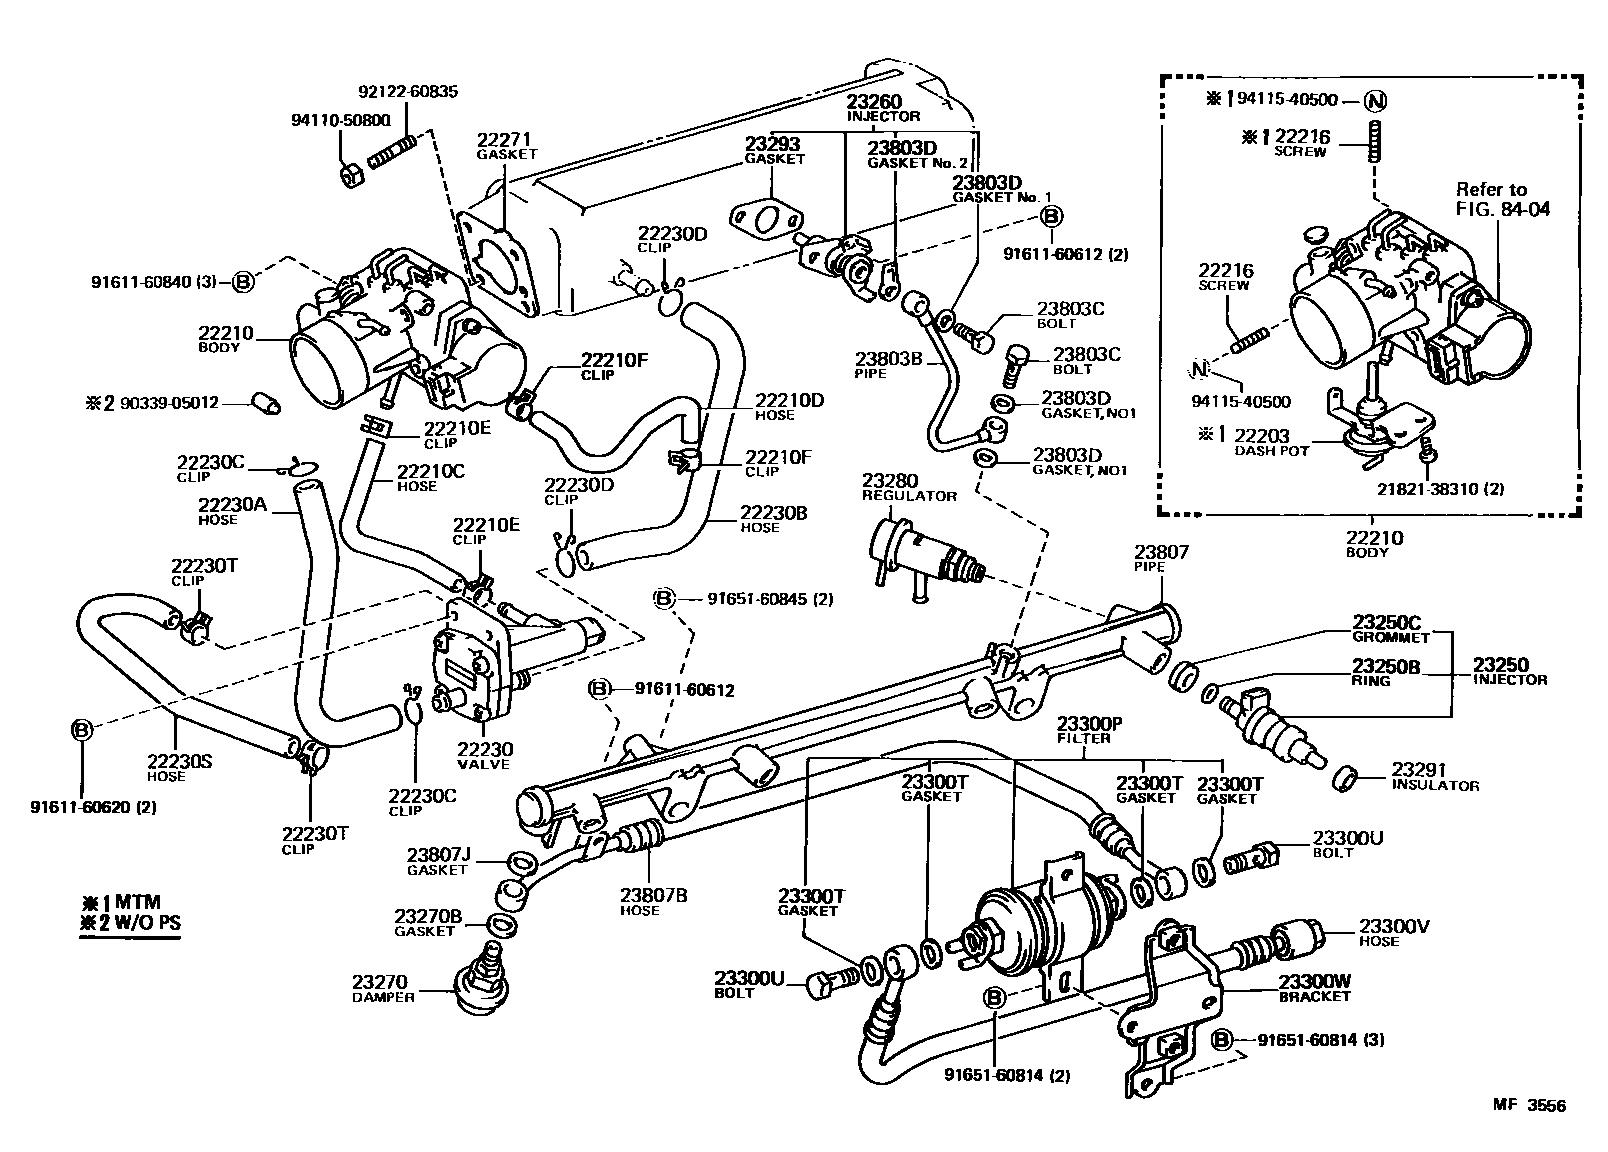 80 image_74e4e9bc0b387403292ba95a6119830226d2b182 joe's 1987 4runner yotatech forums 1987 toyota 4runner wiring diagram at eliteediting.co